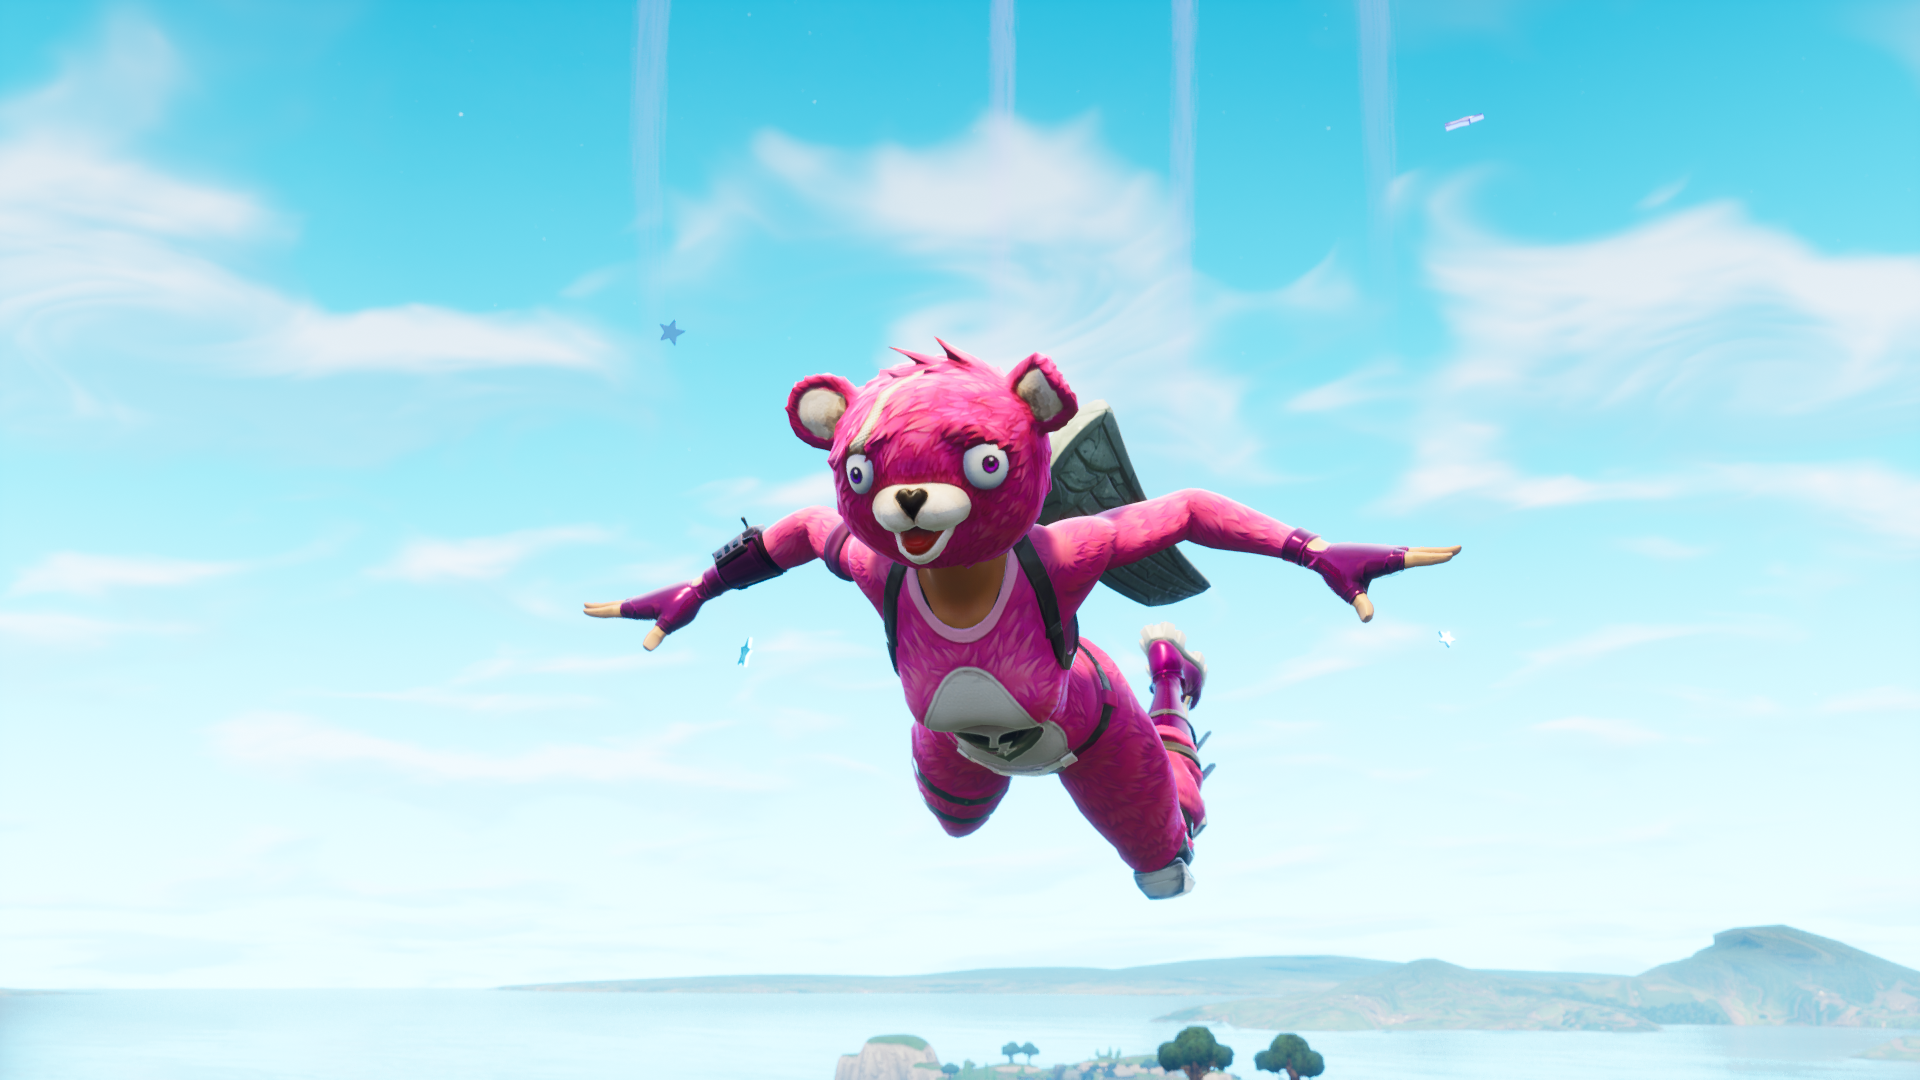 Fortnite Pink Video Games Teddy Bears Cyan Wallpaper Resolution 1920x1080 Id 142544 Wallha Com